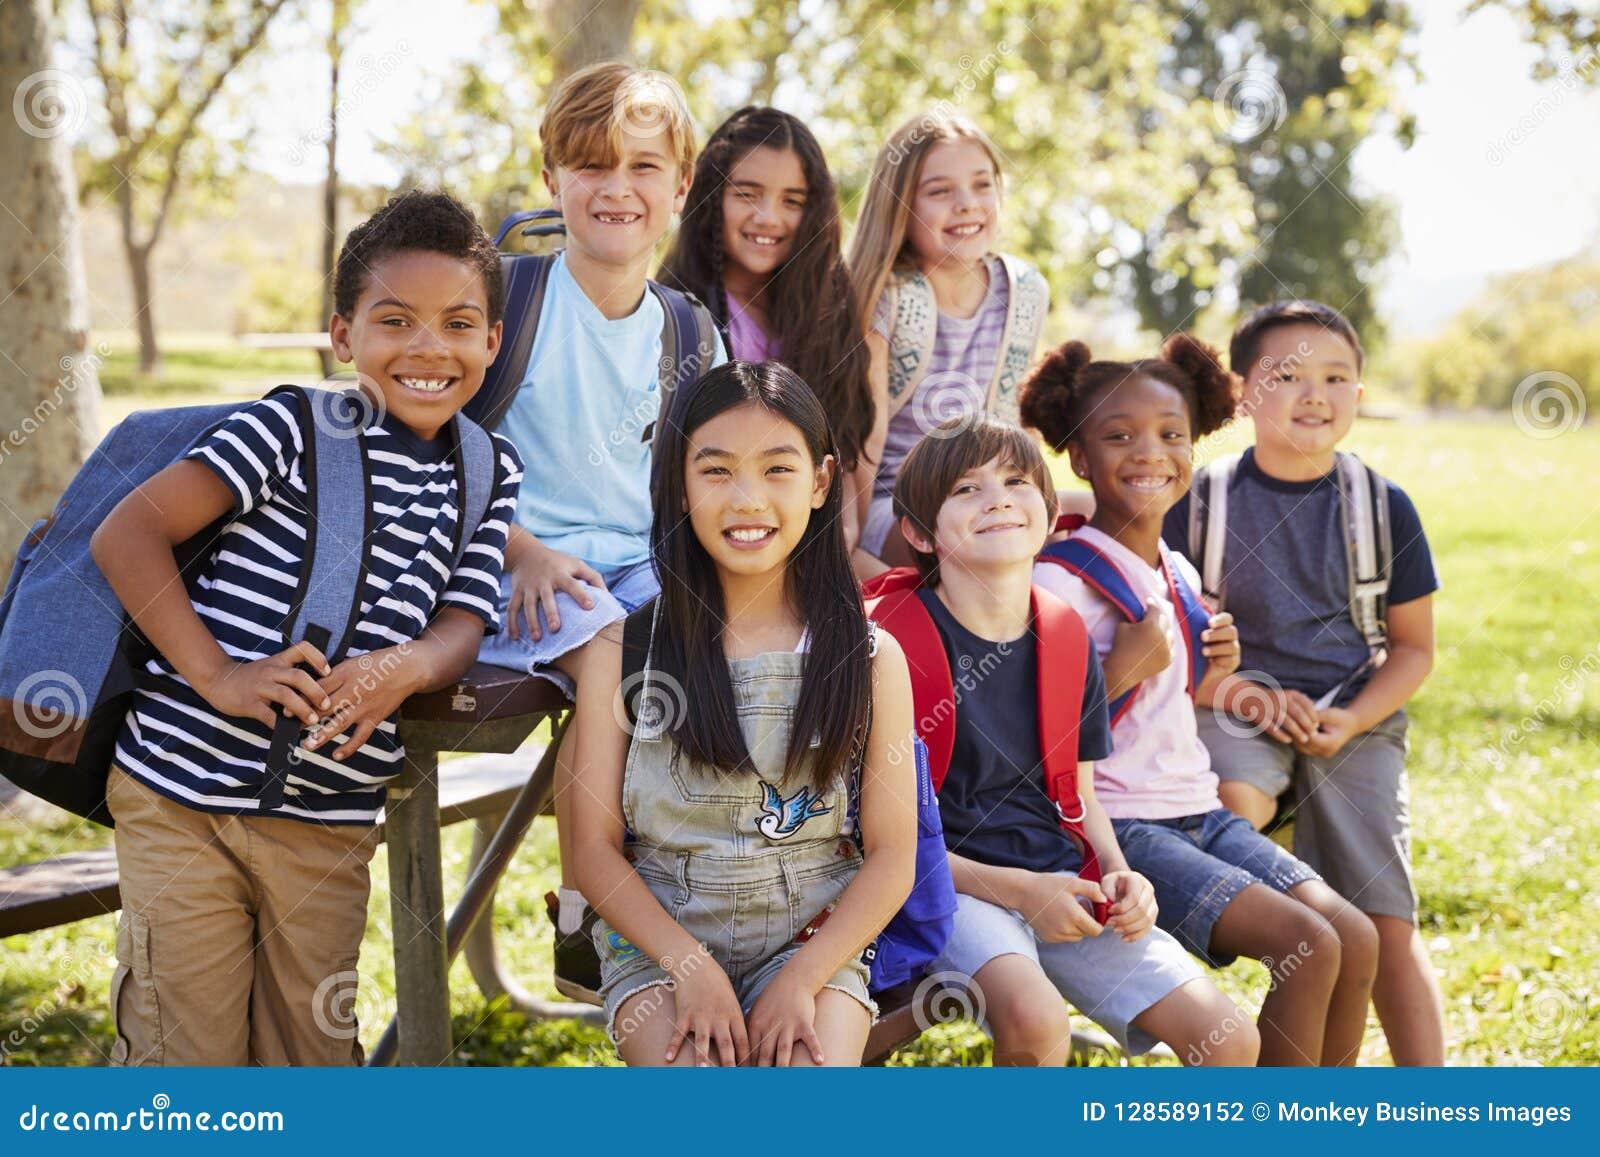 Multi-ethnic group of schoolchildren on school trip, close up